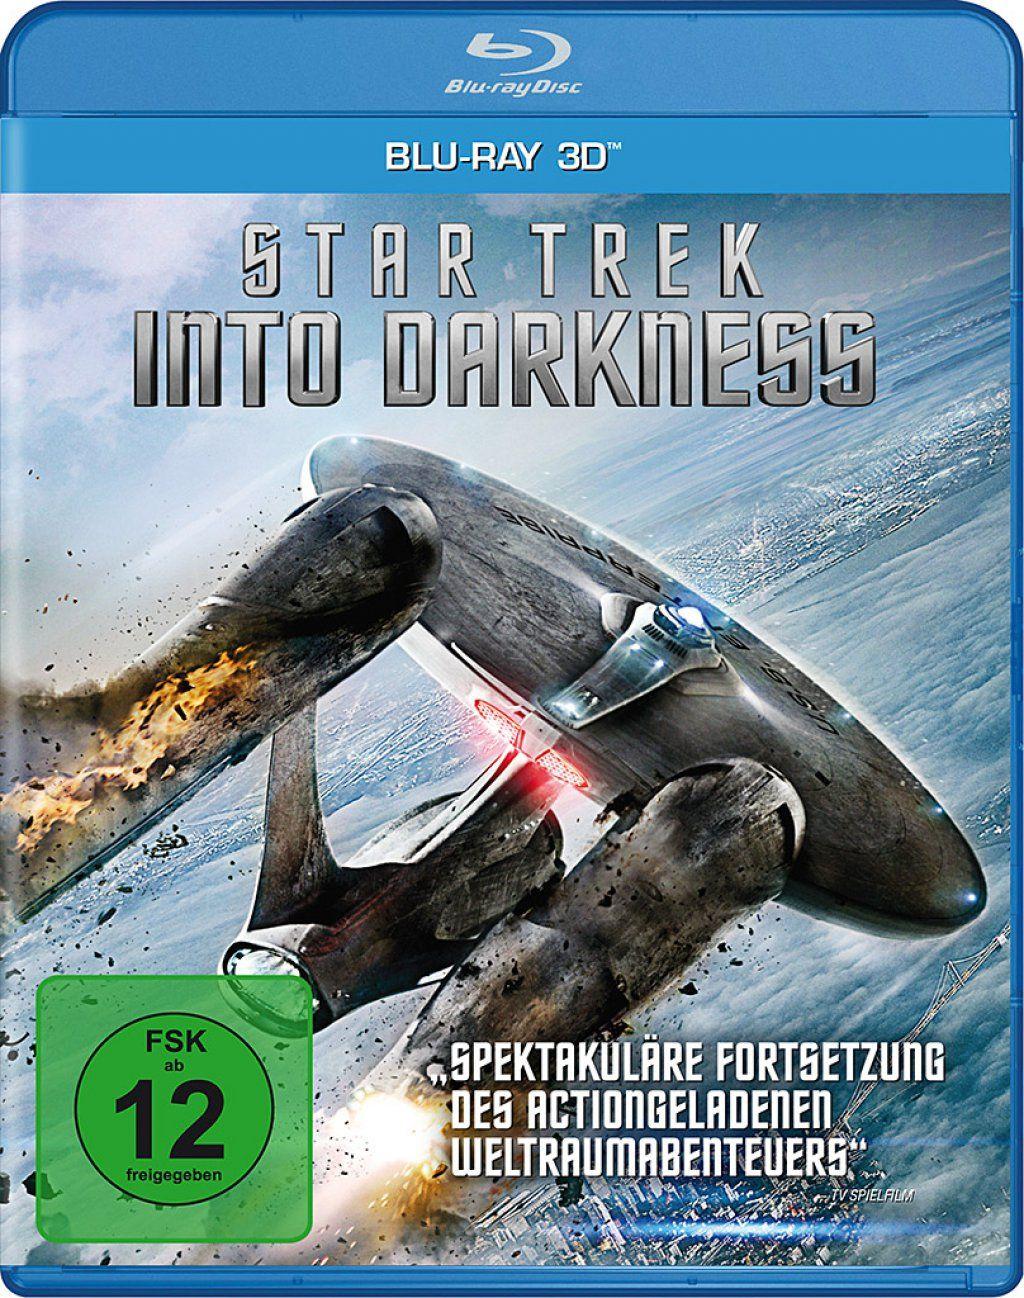 Star Trek - Into Darkness 3D (BLURAY 3D)